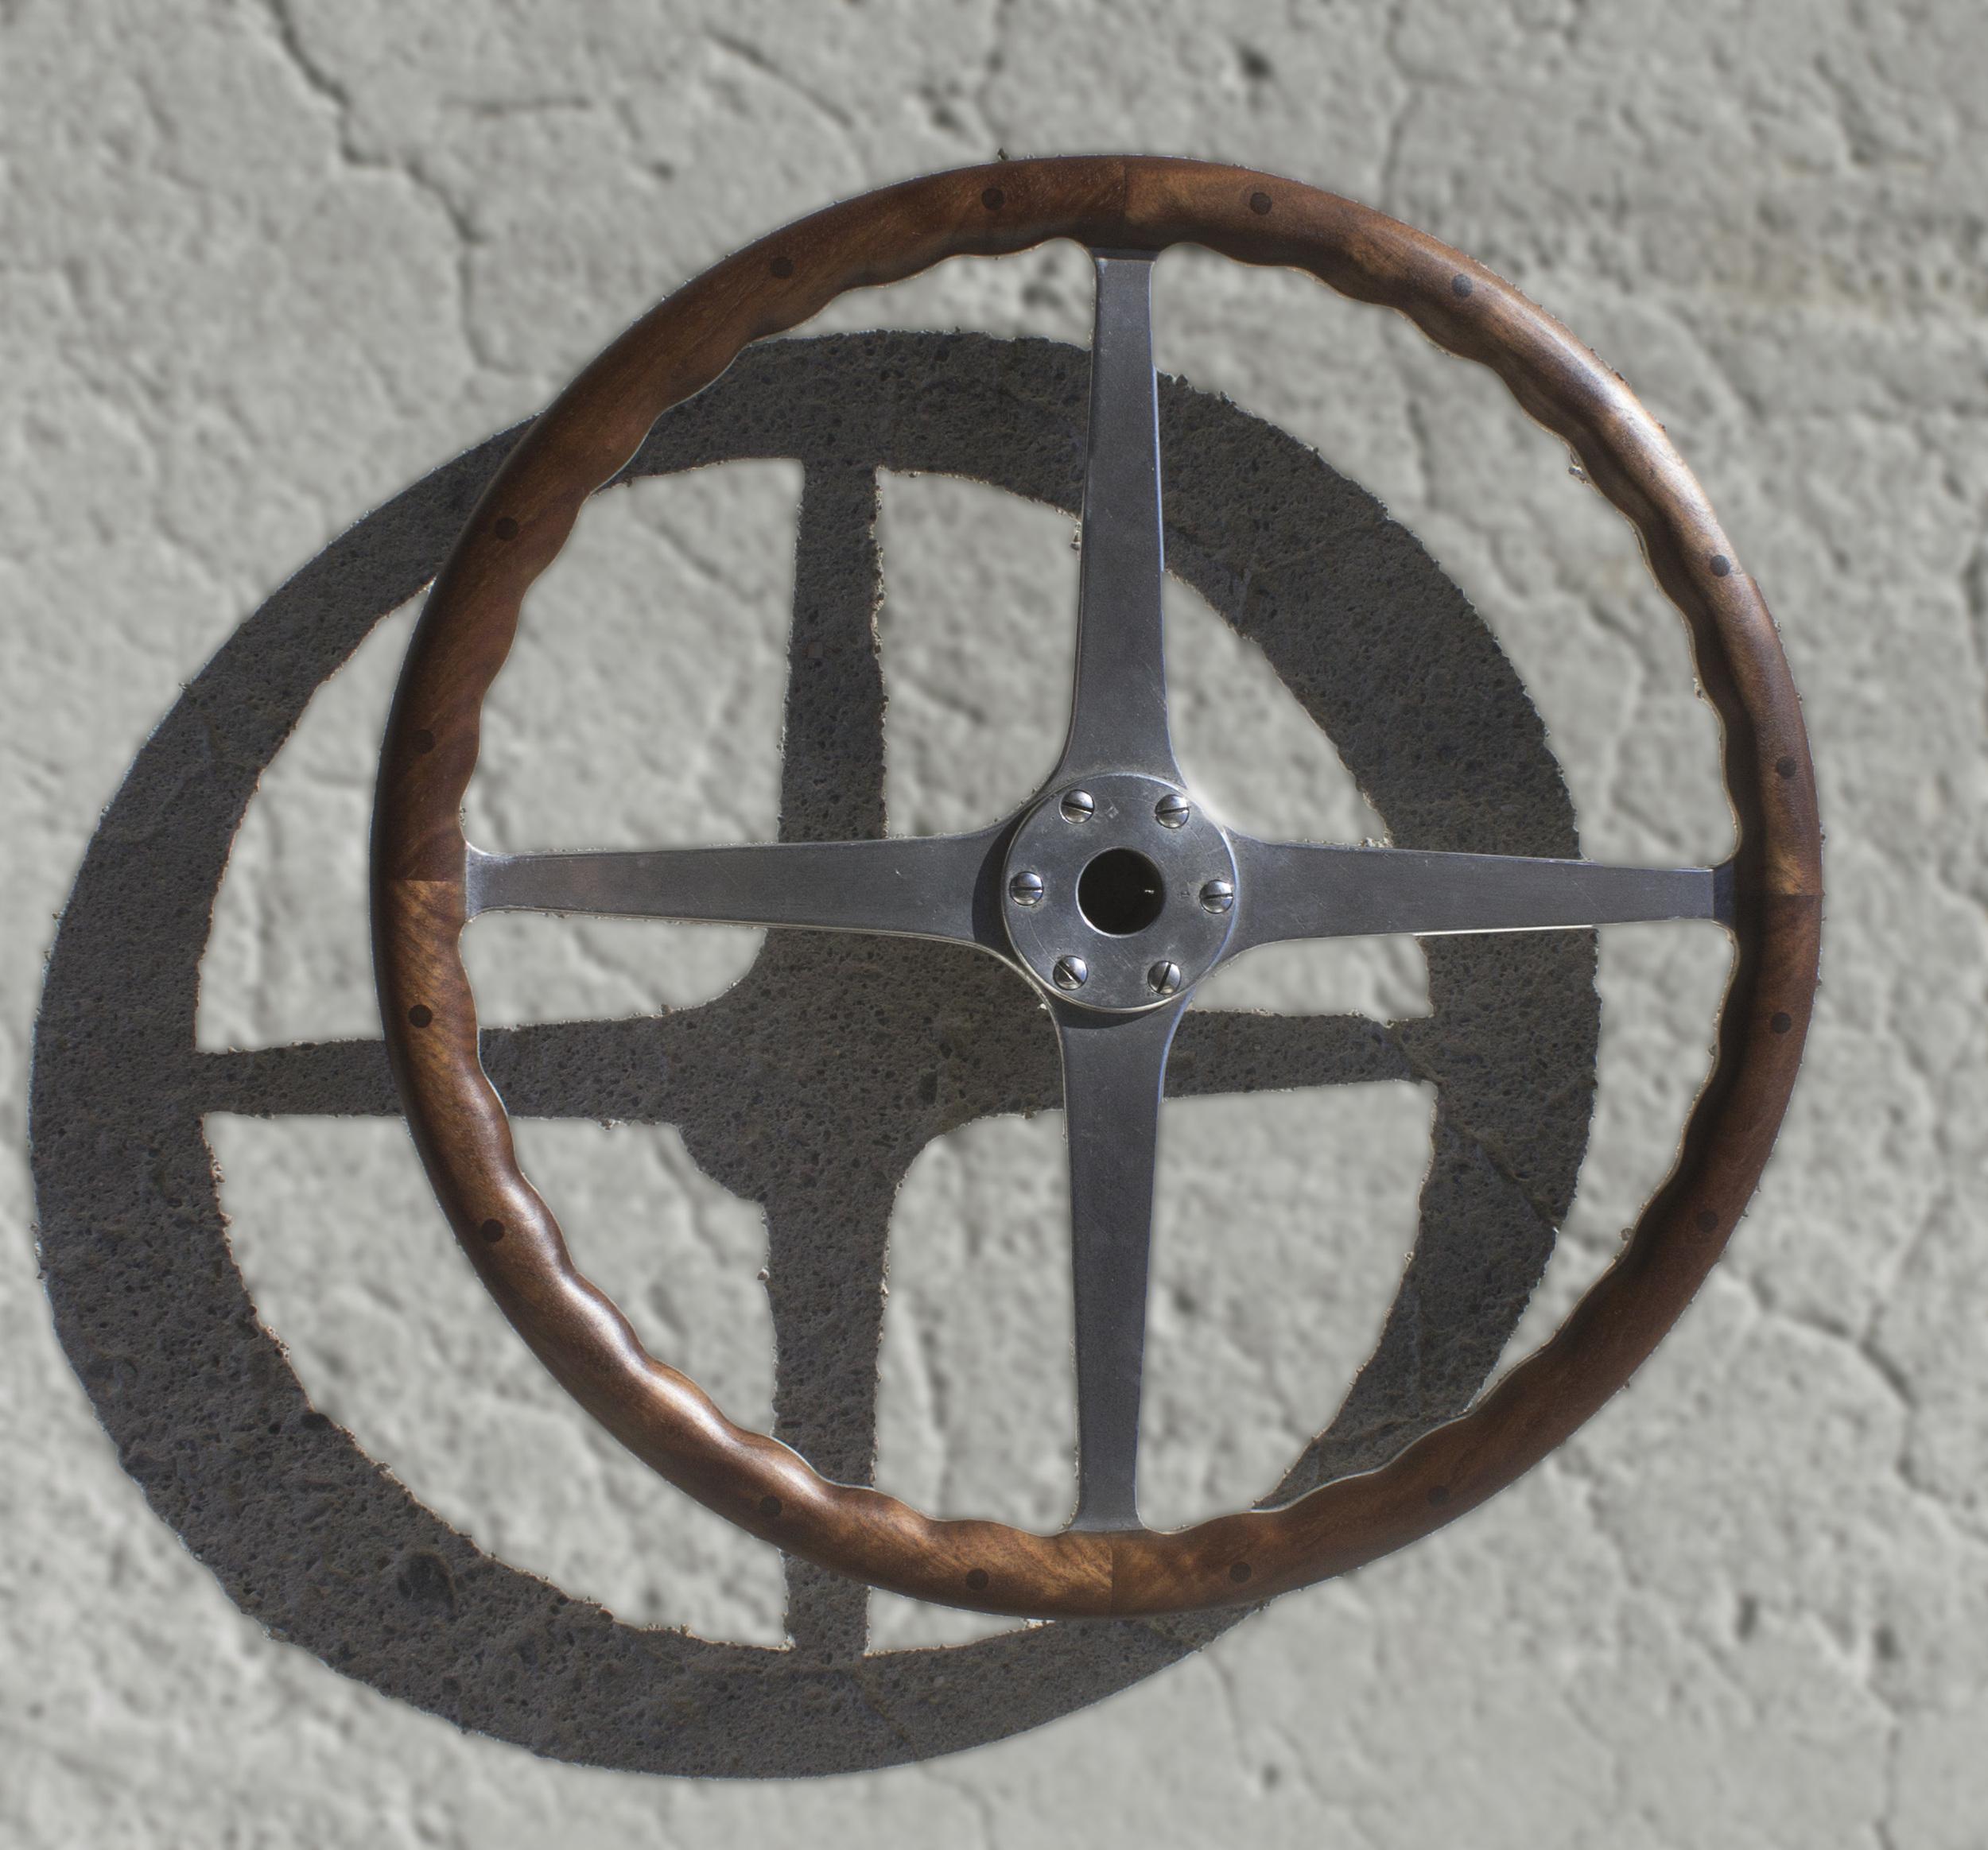 finished steering wheel 1.6.15.jpg